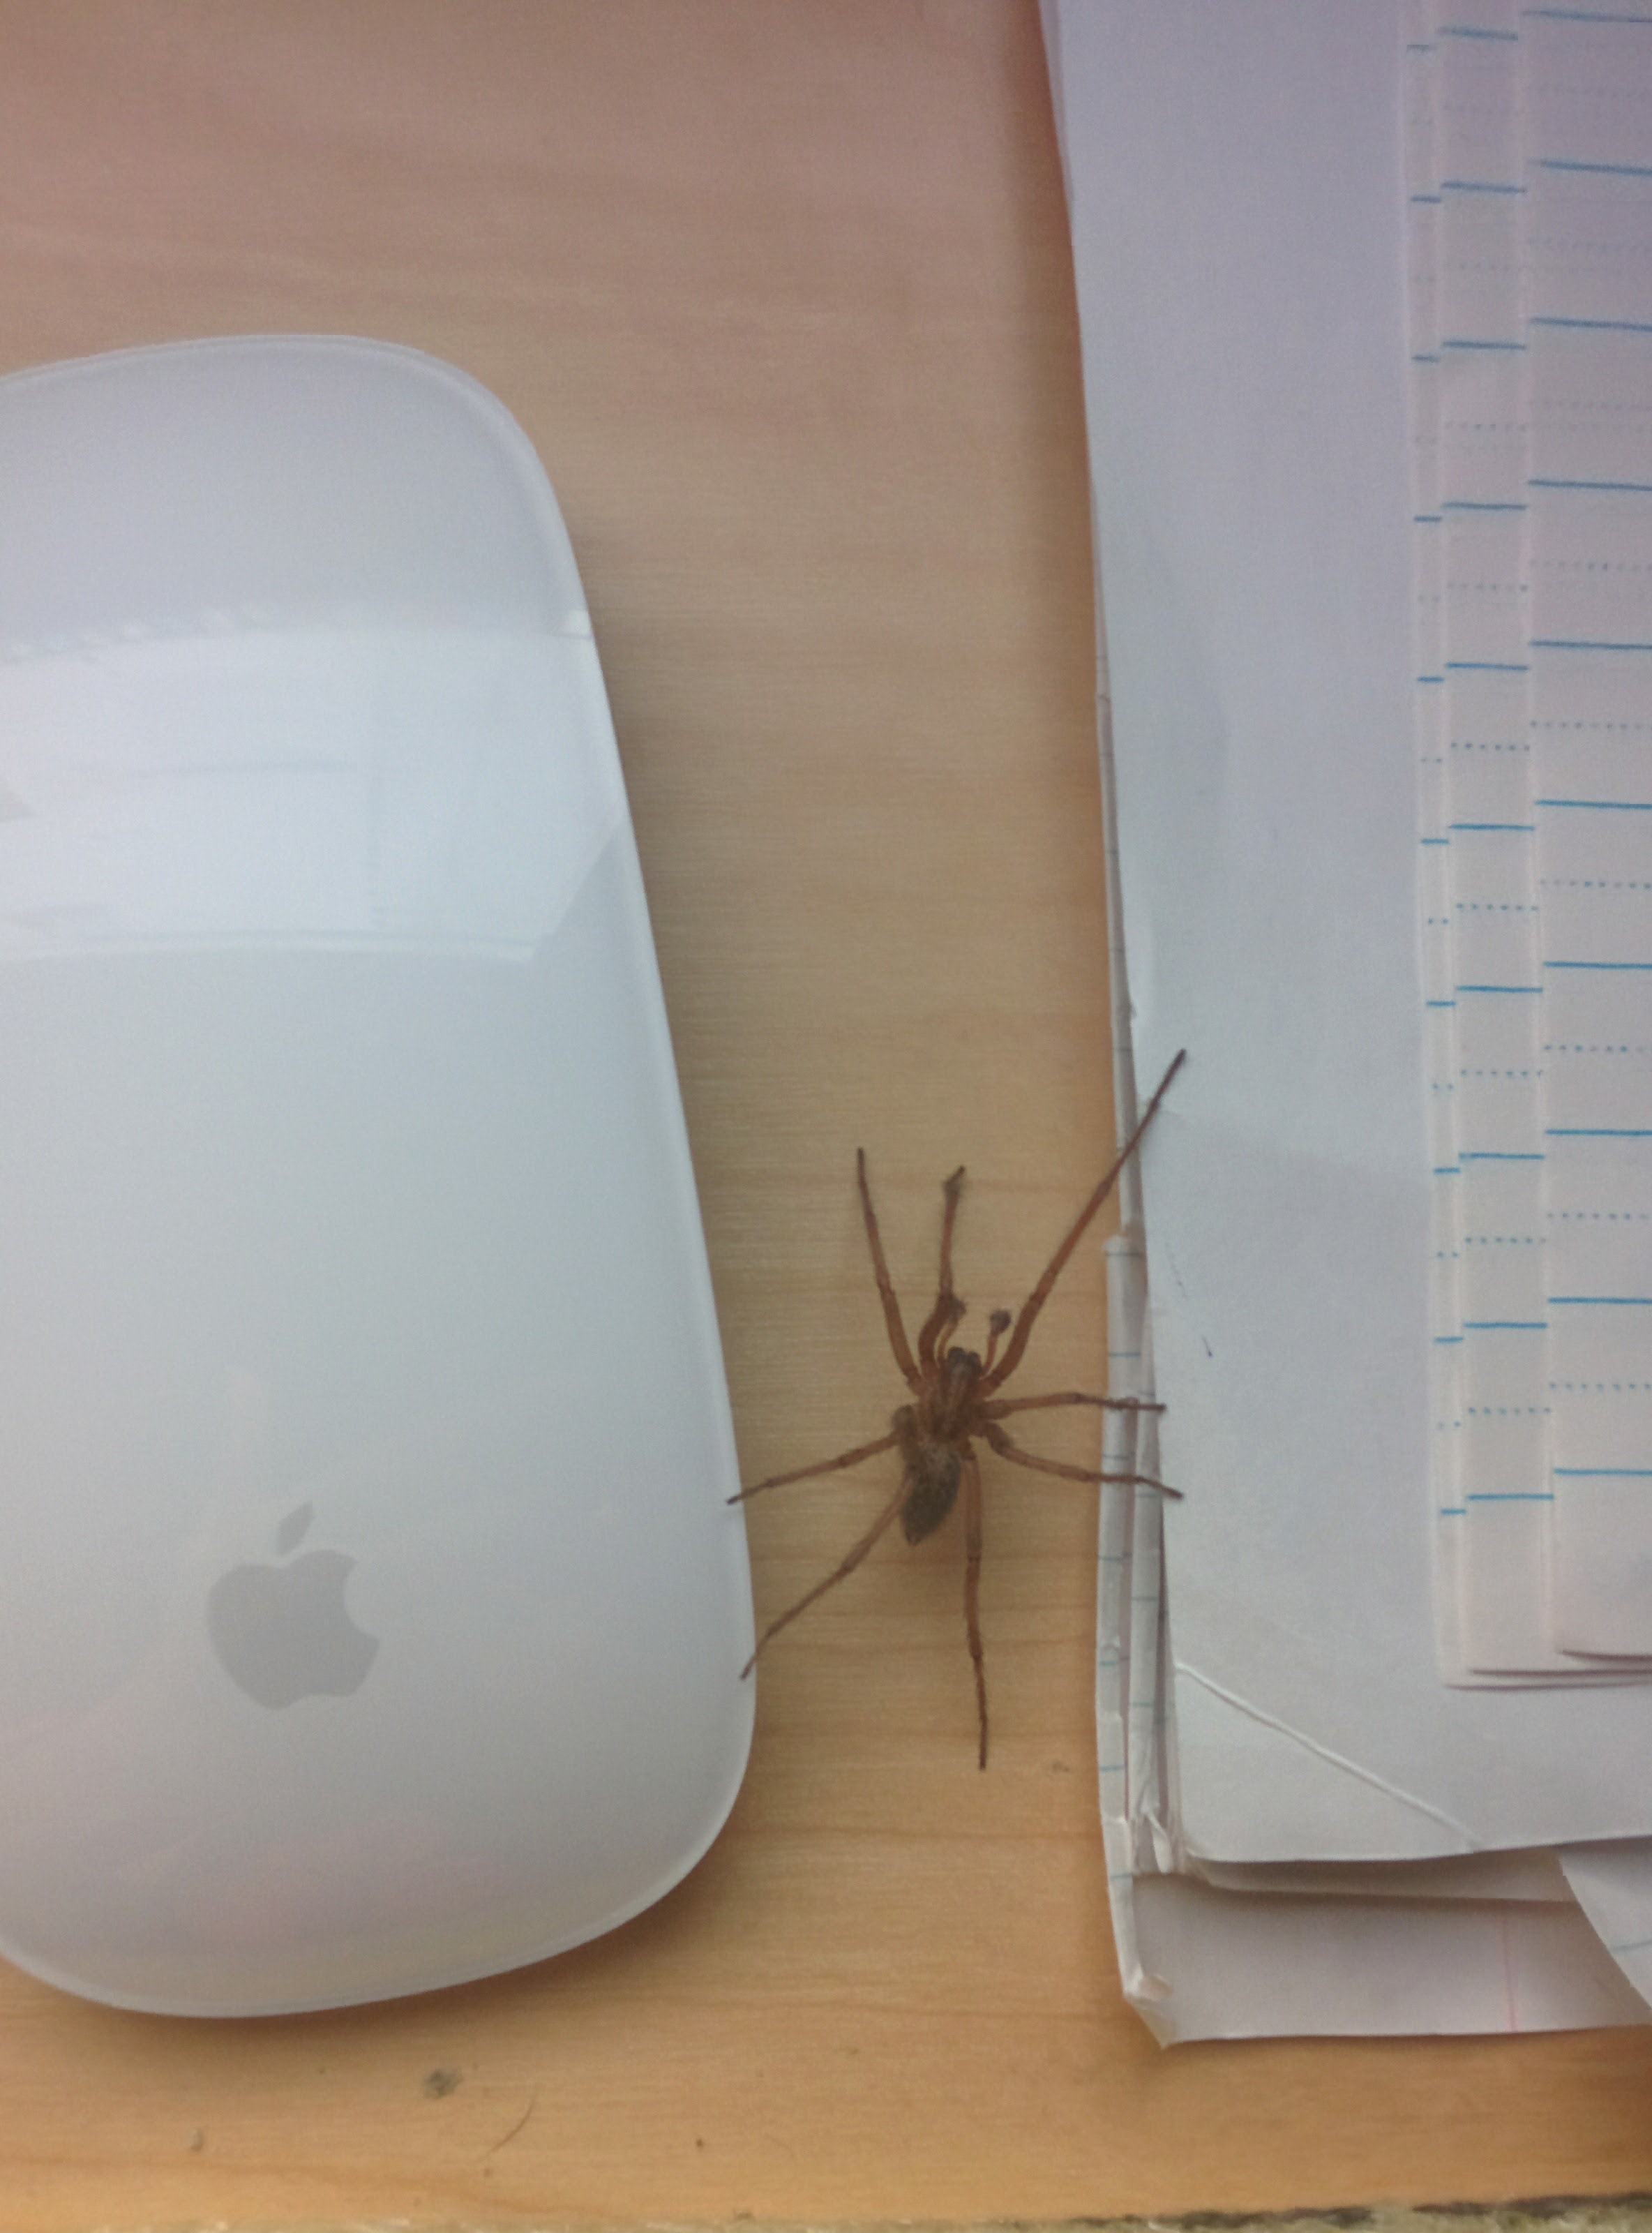 Picture of Eratigena agrestis (Hobo Spider) - Male - Dorsal